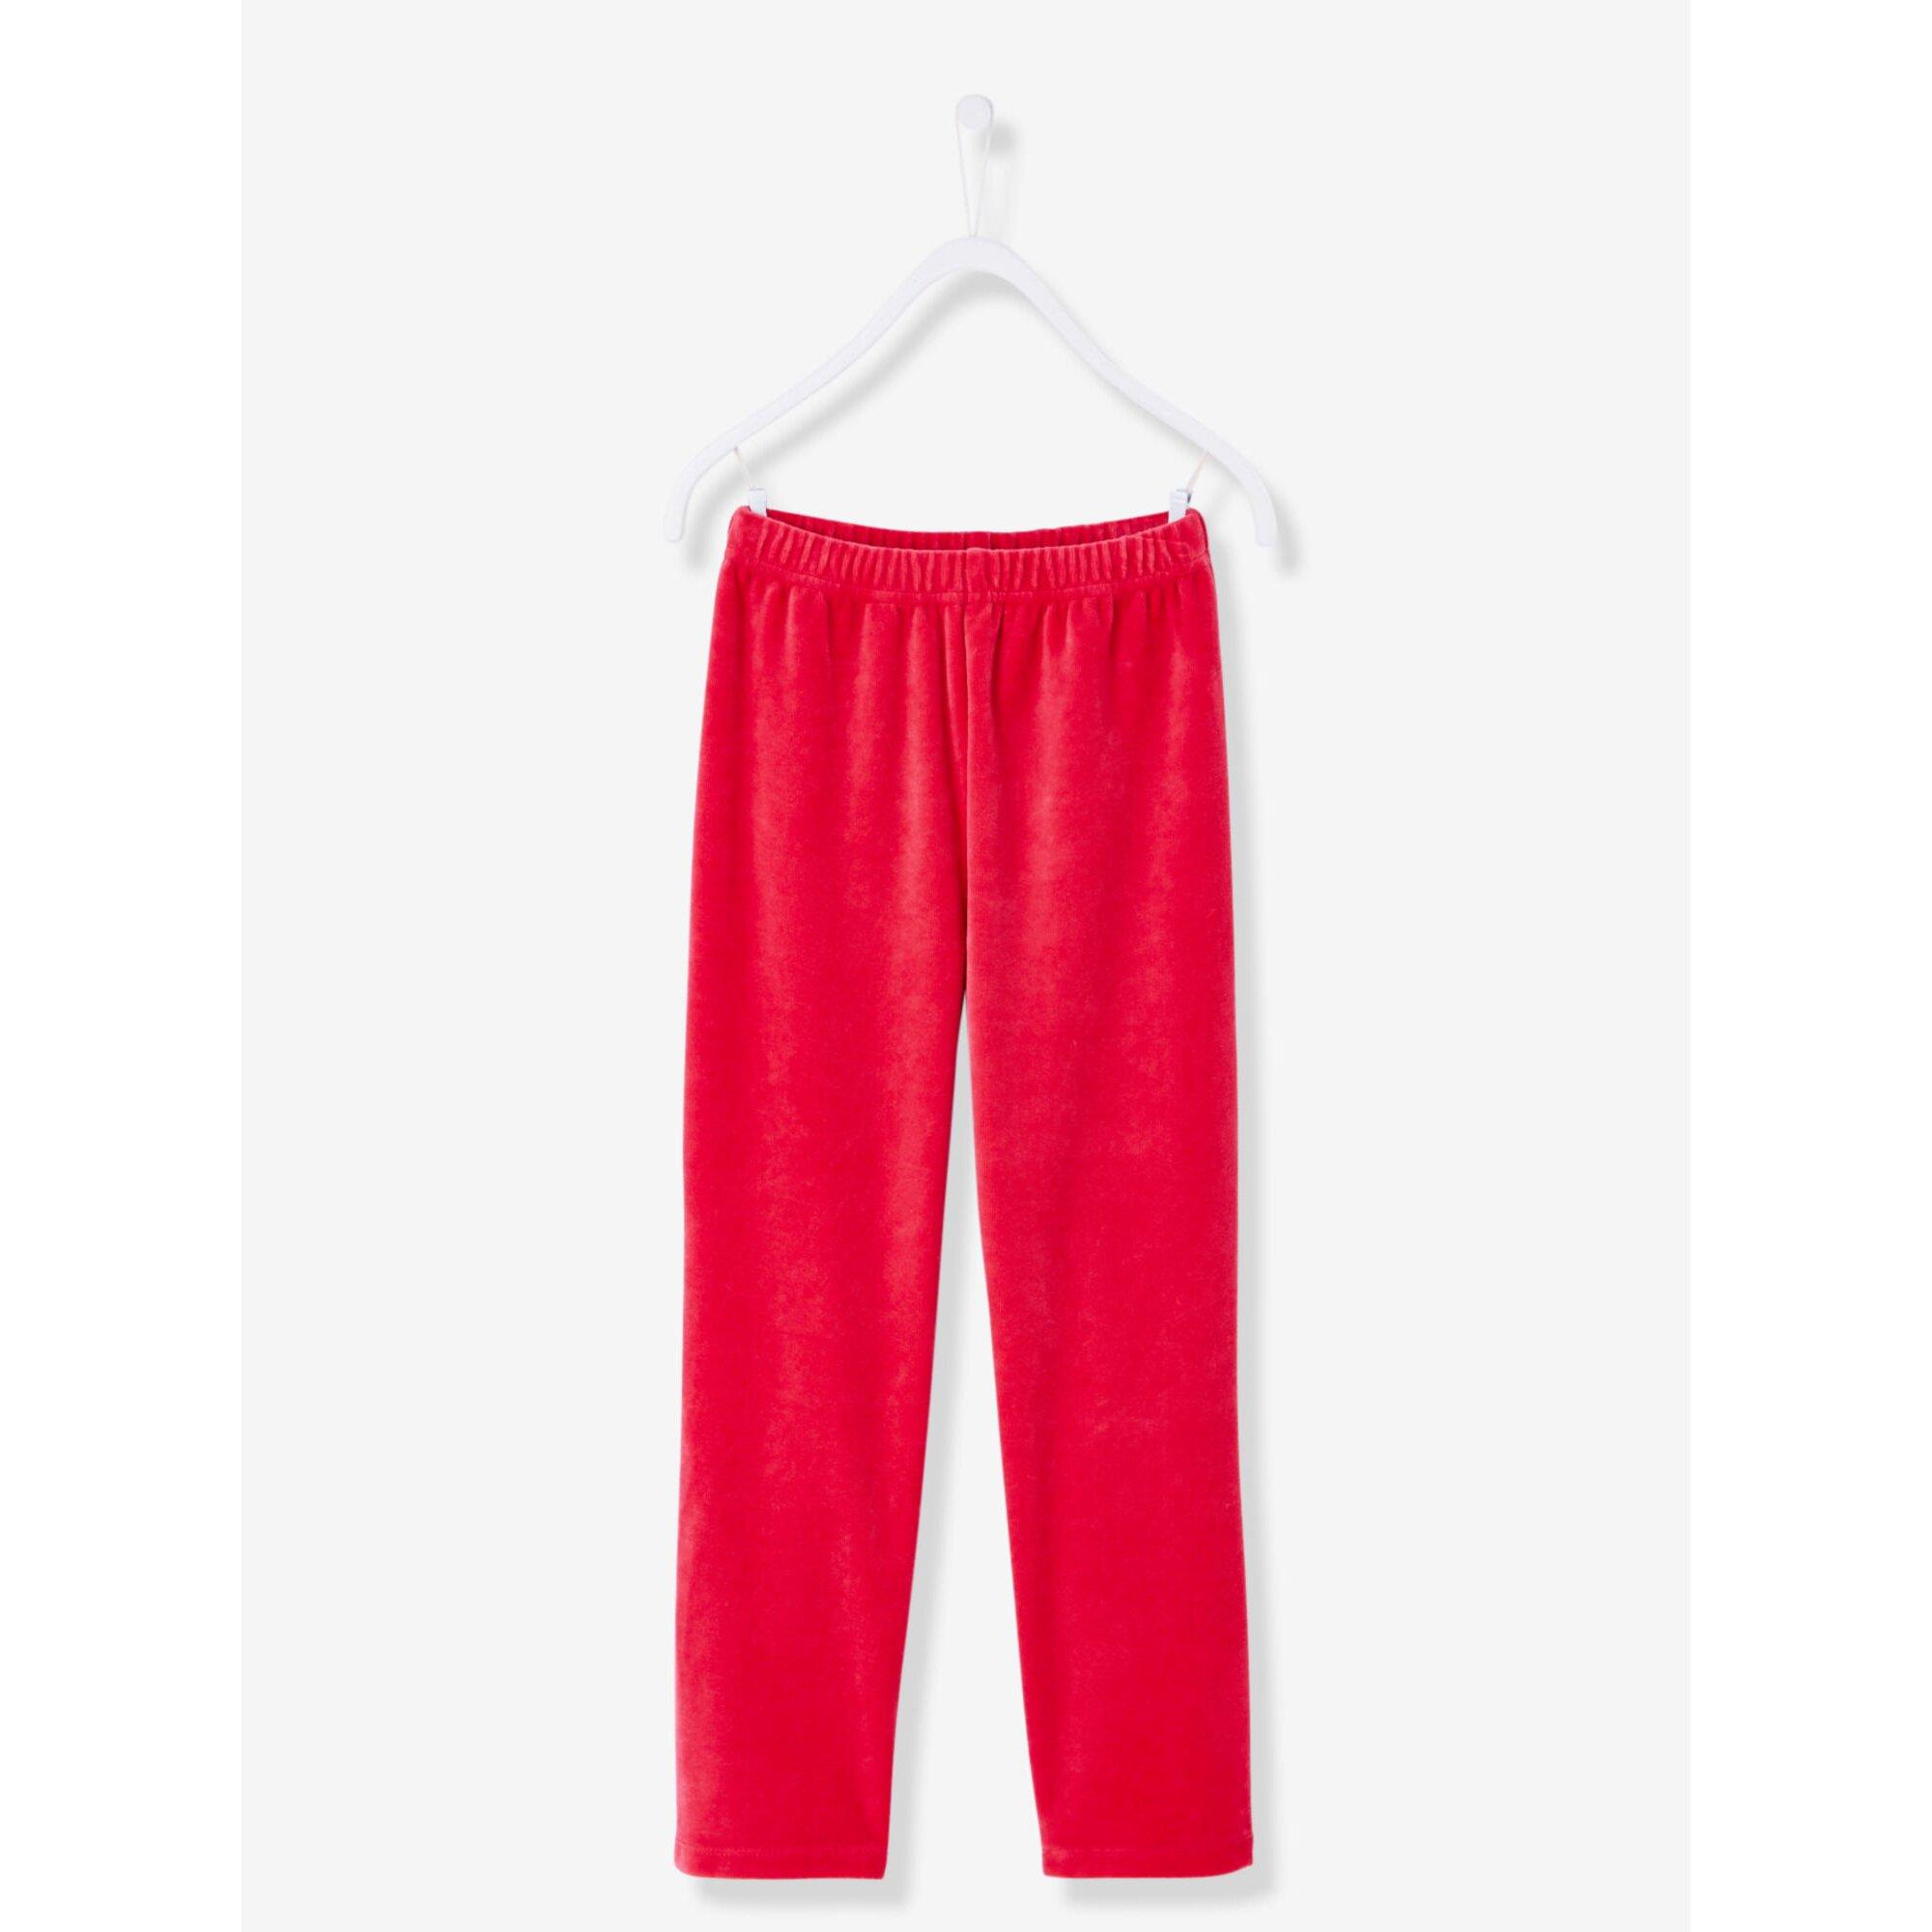 vertbaudet-samt-pyjama-fur-madchen